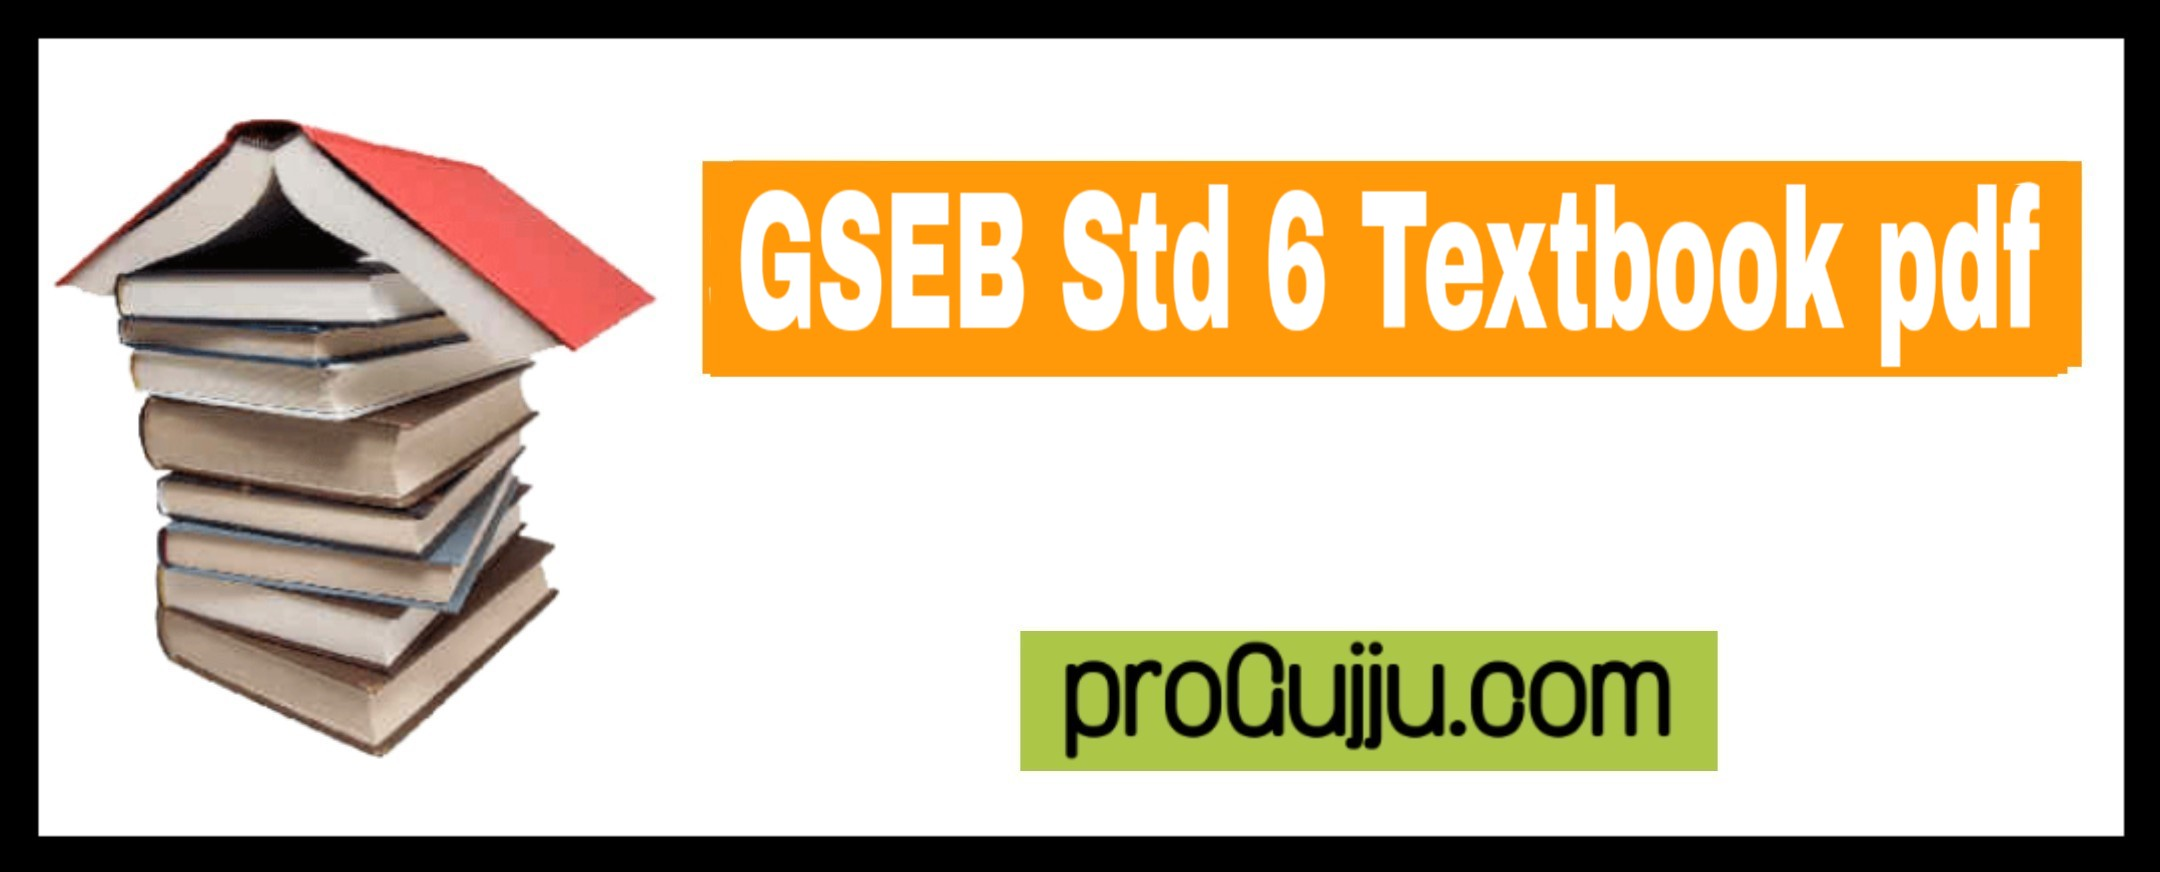 Gseb std 6 textbook